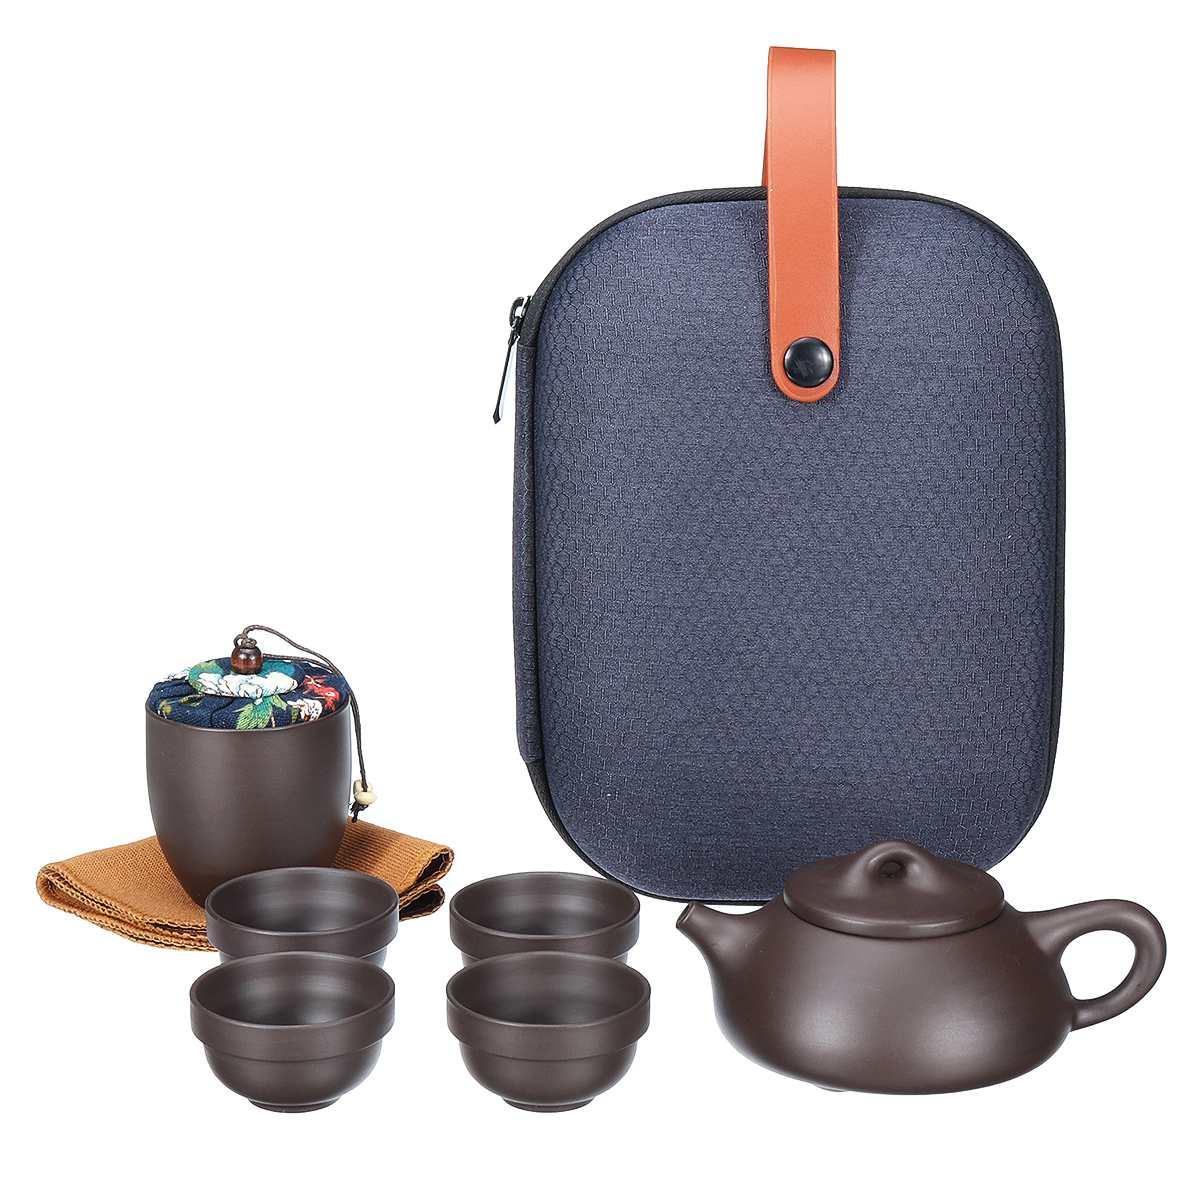 Teaware Sets Portable Teapot Tea Set Gift Chinese Purple Sand Tea Pot + 4 Cups + 1 Storage Bag Travel Drinkware Kitchen Tools